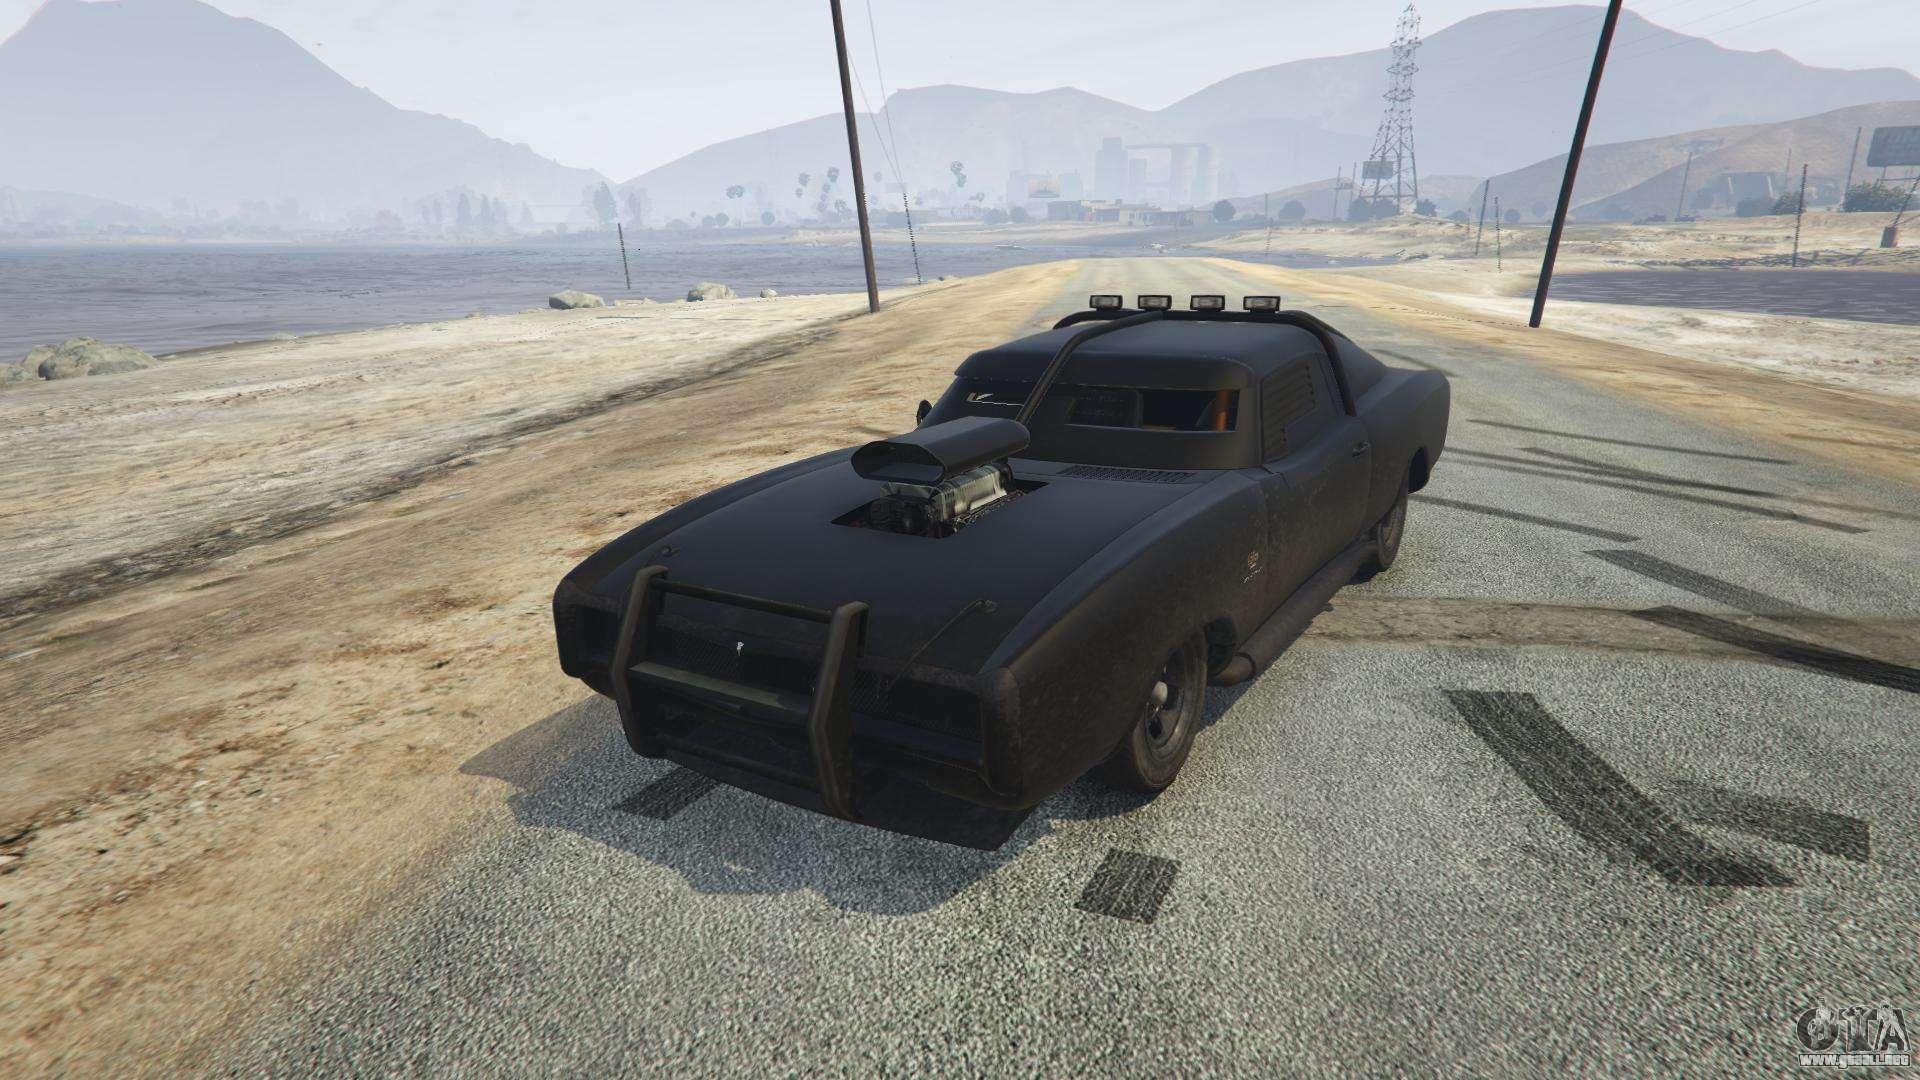 Duke O'Death de GTA 5 - vista frontal